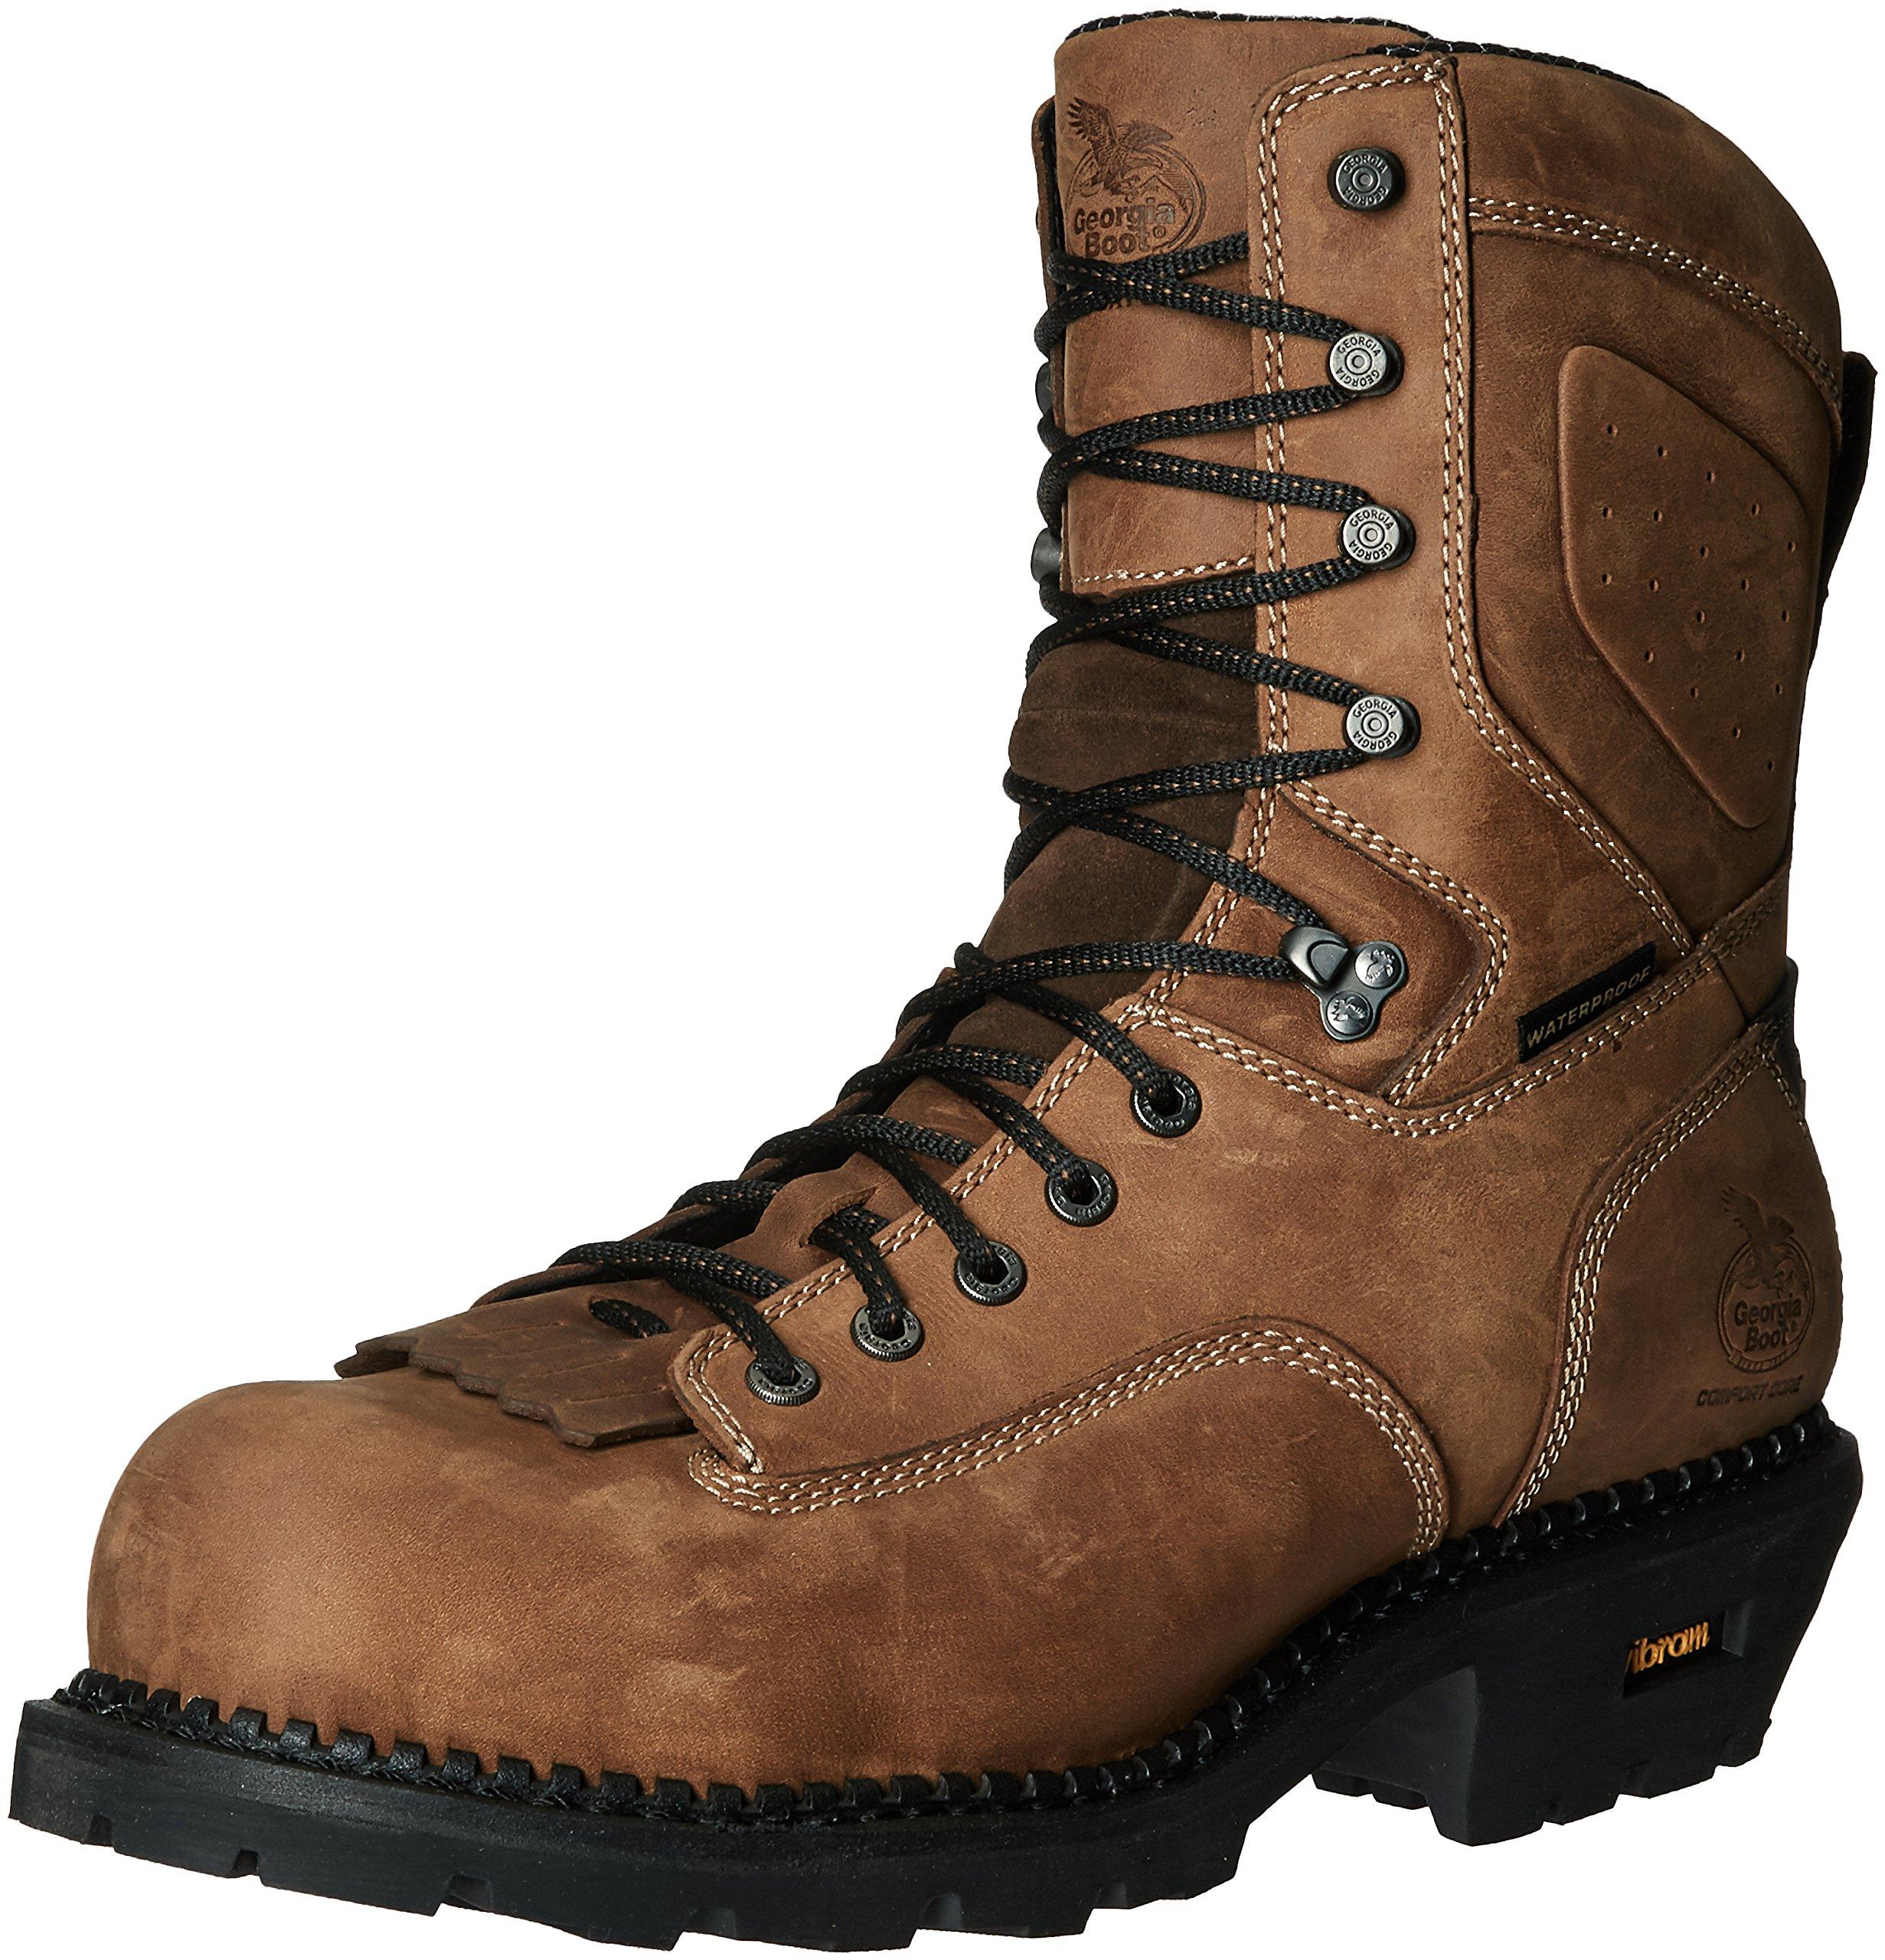 6f5f254da3a Details about Georgia Men's GB00098 Mid Calf Boot Brown 10.5 W US